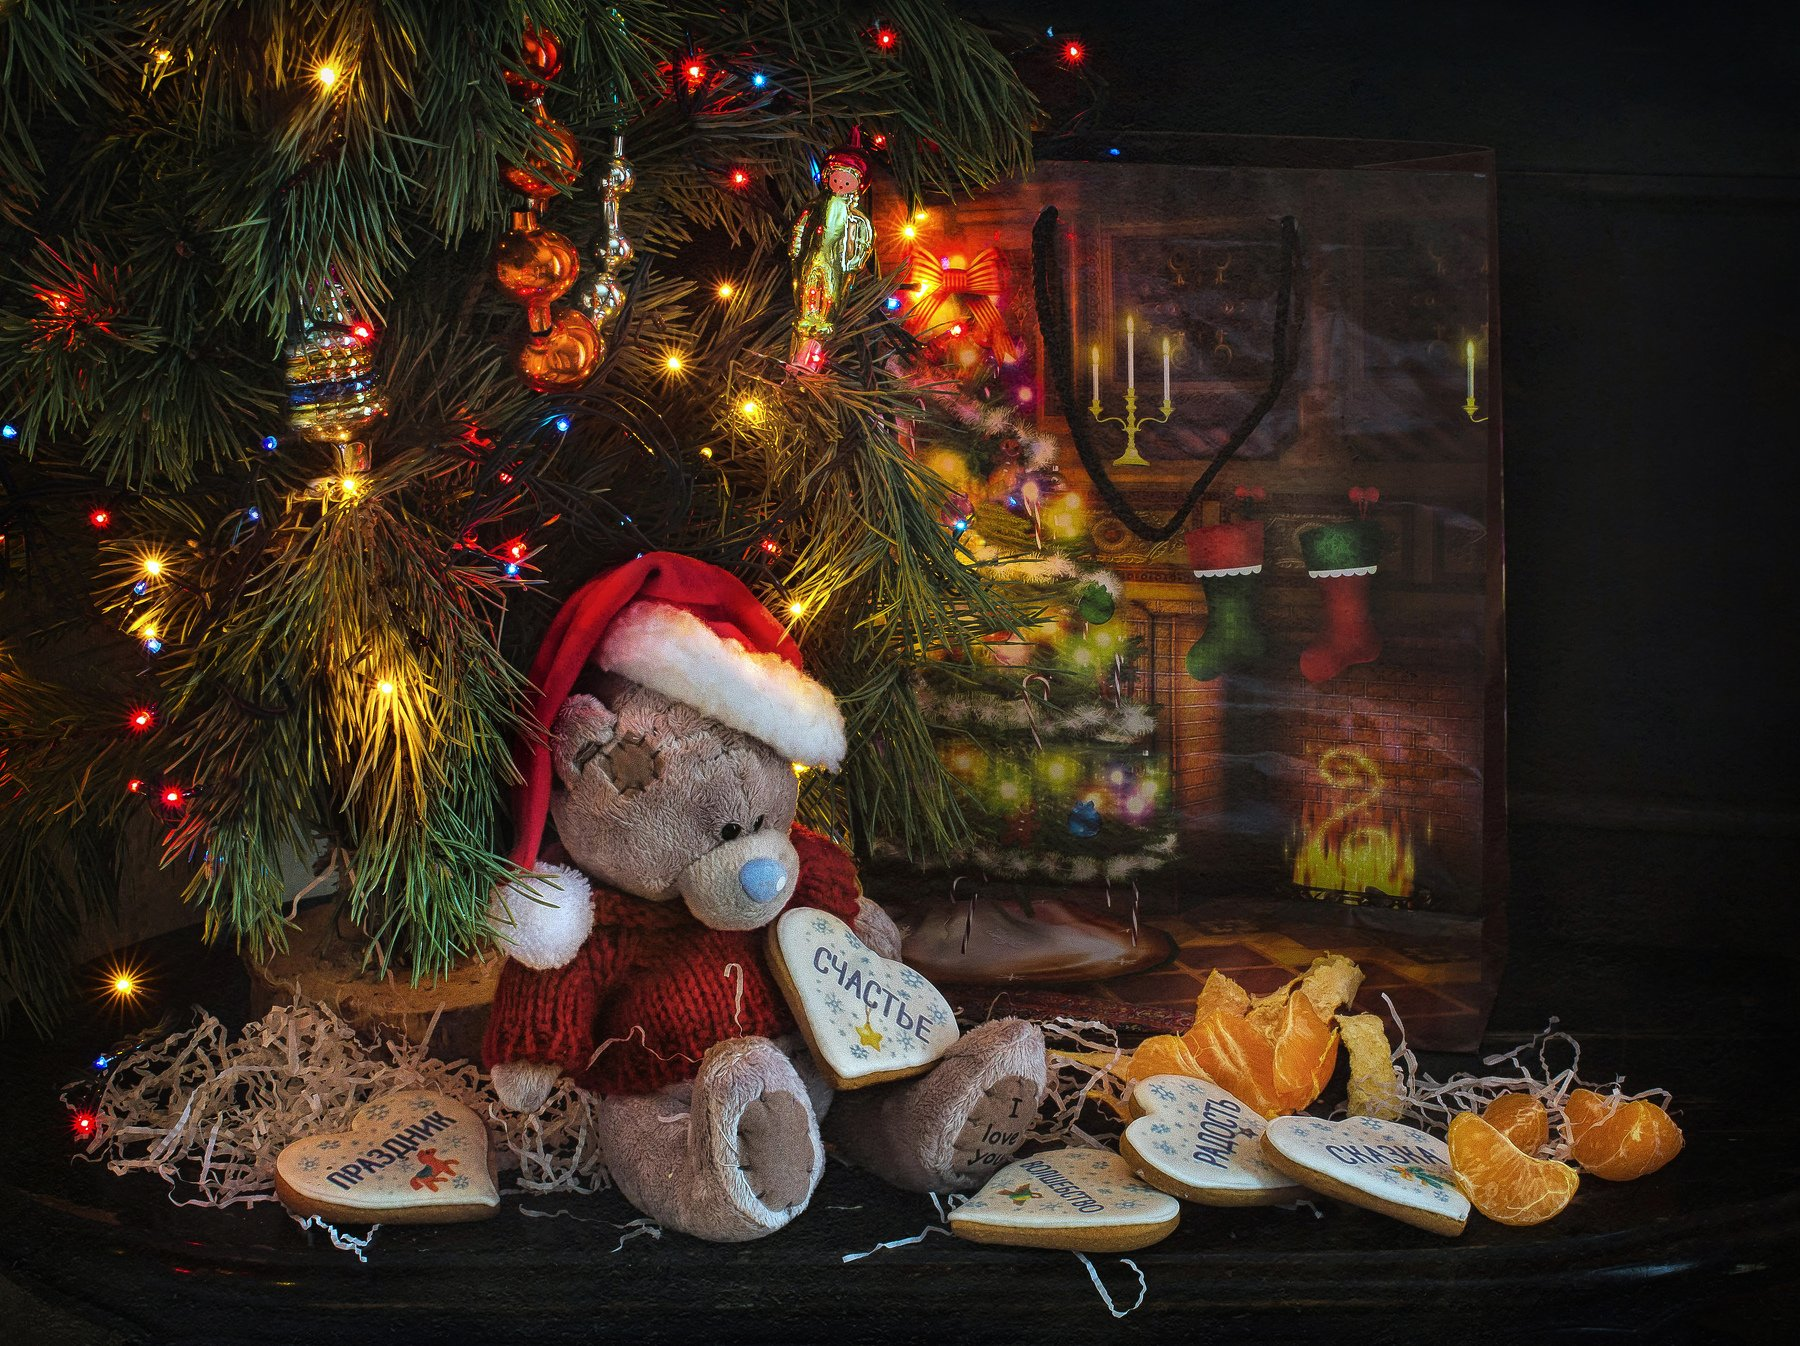 натюрморт, ёлка, игрушки, пряники, новый год, Анна Петина